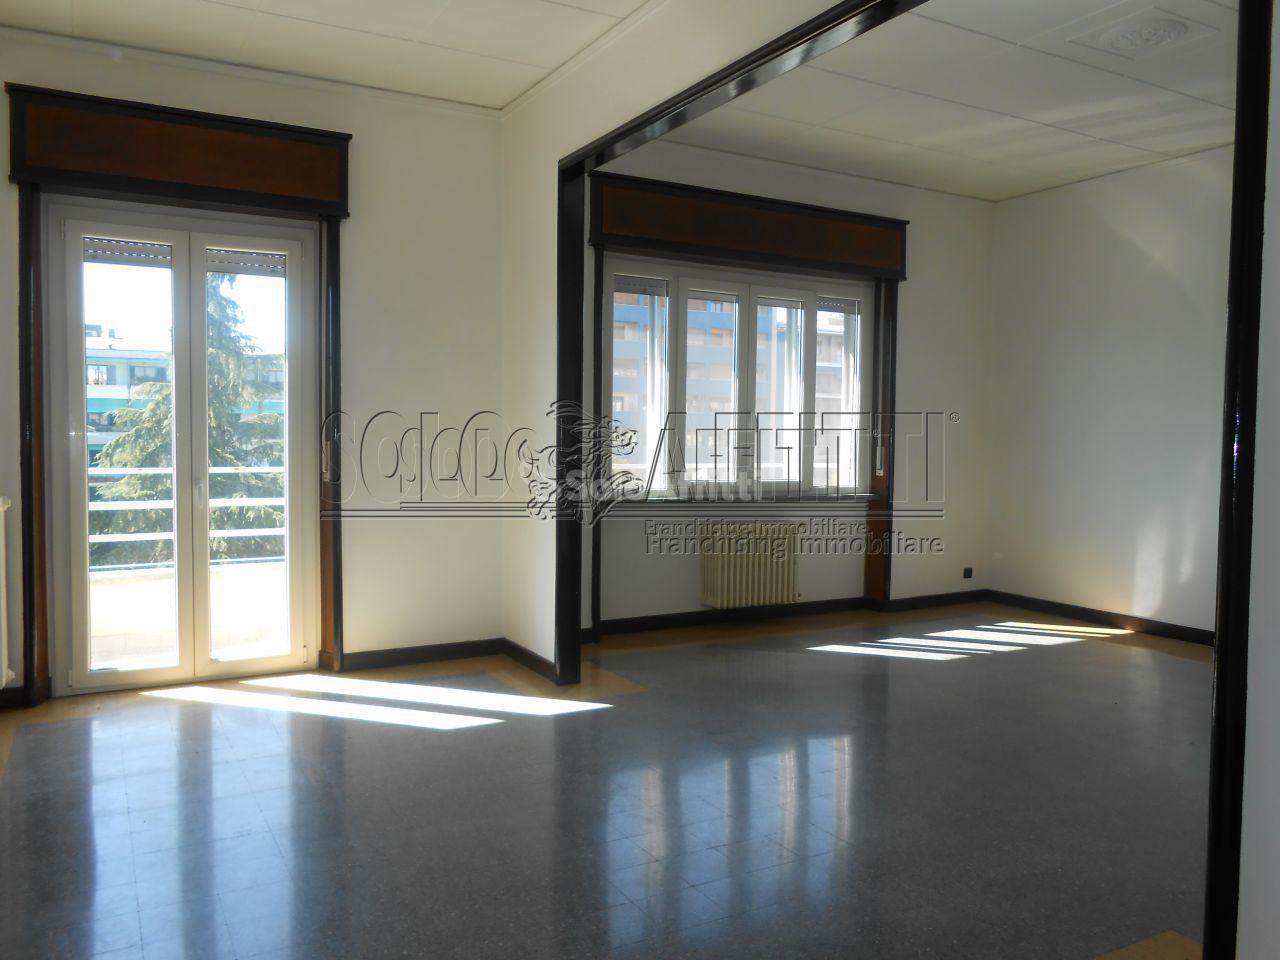 Appartamento, 180 Mq, Affitto - Pavia (Pavia)